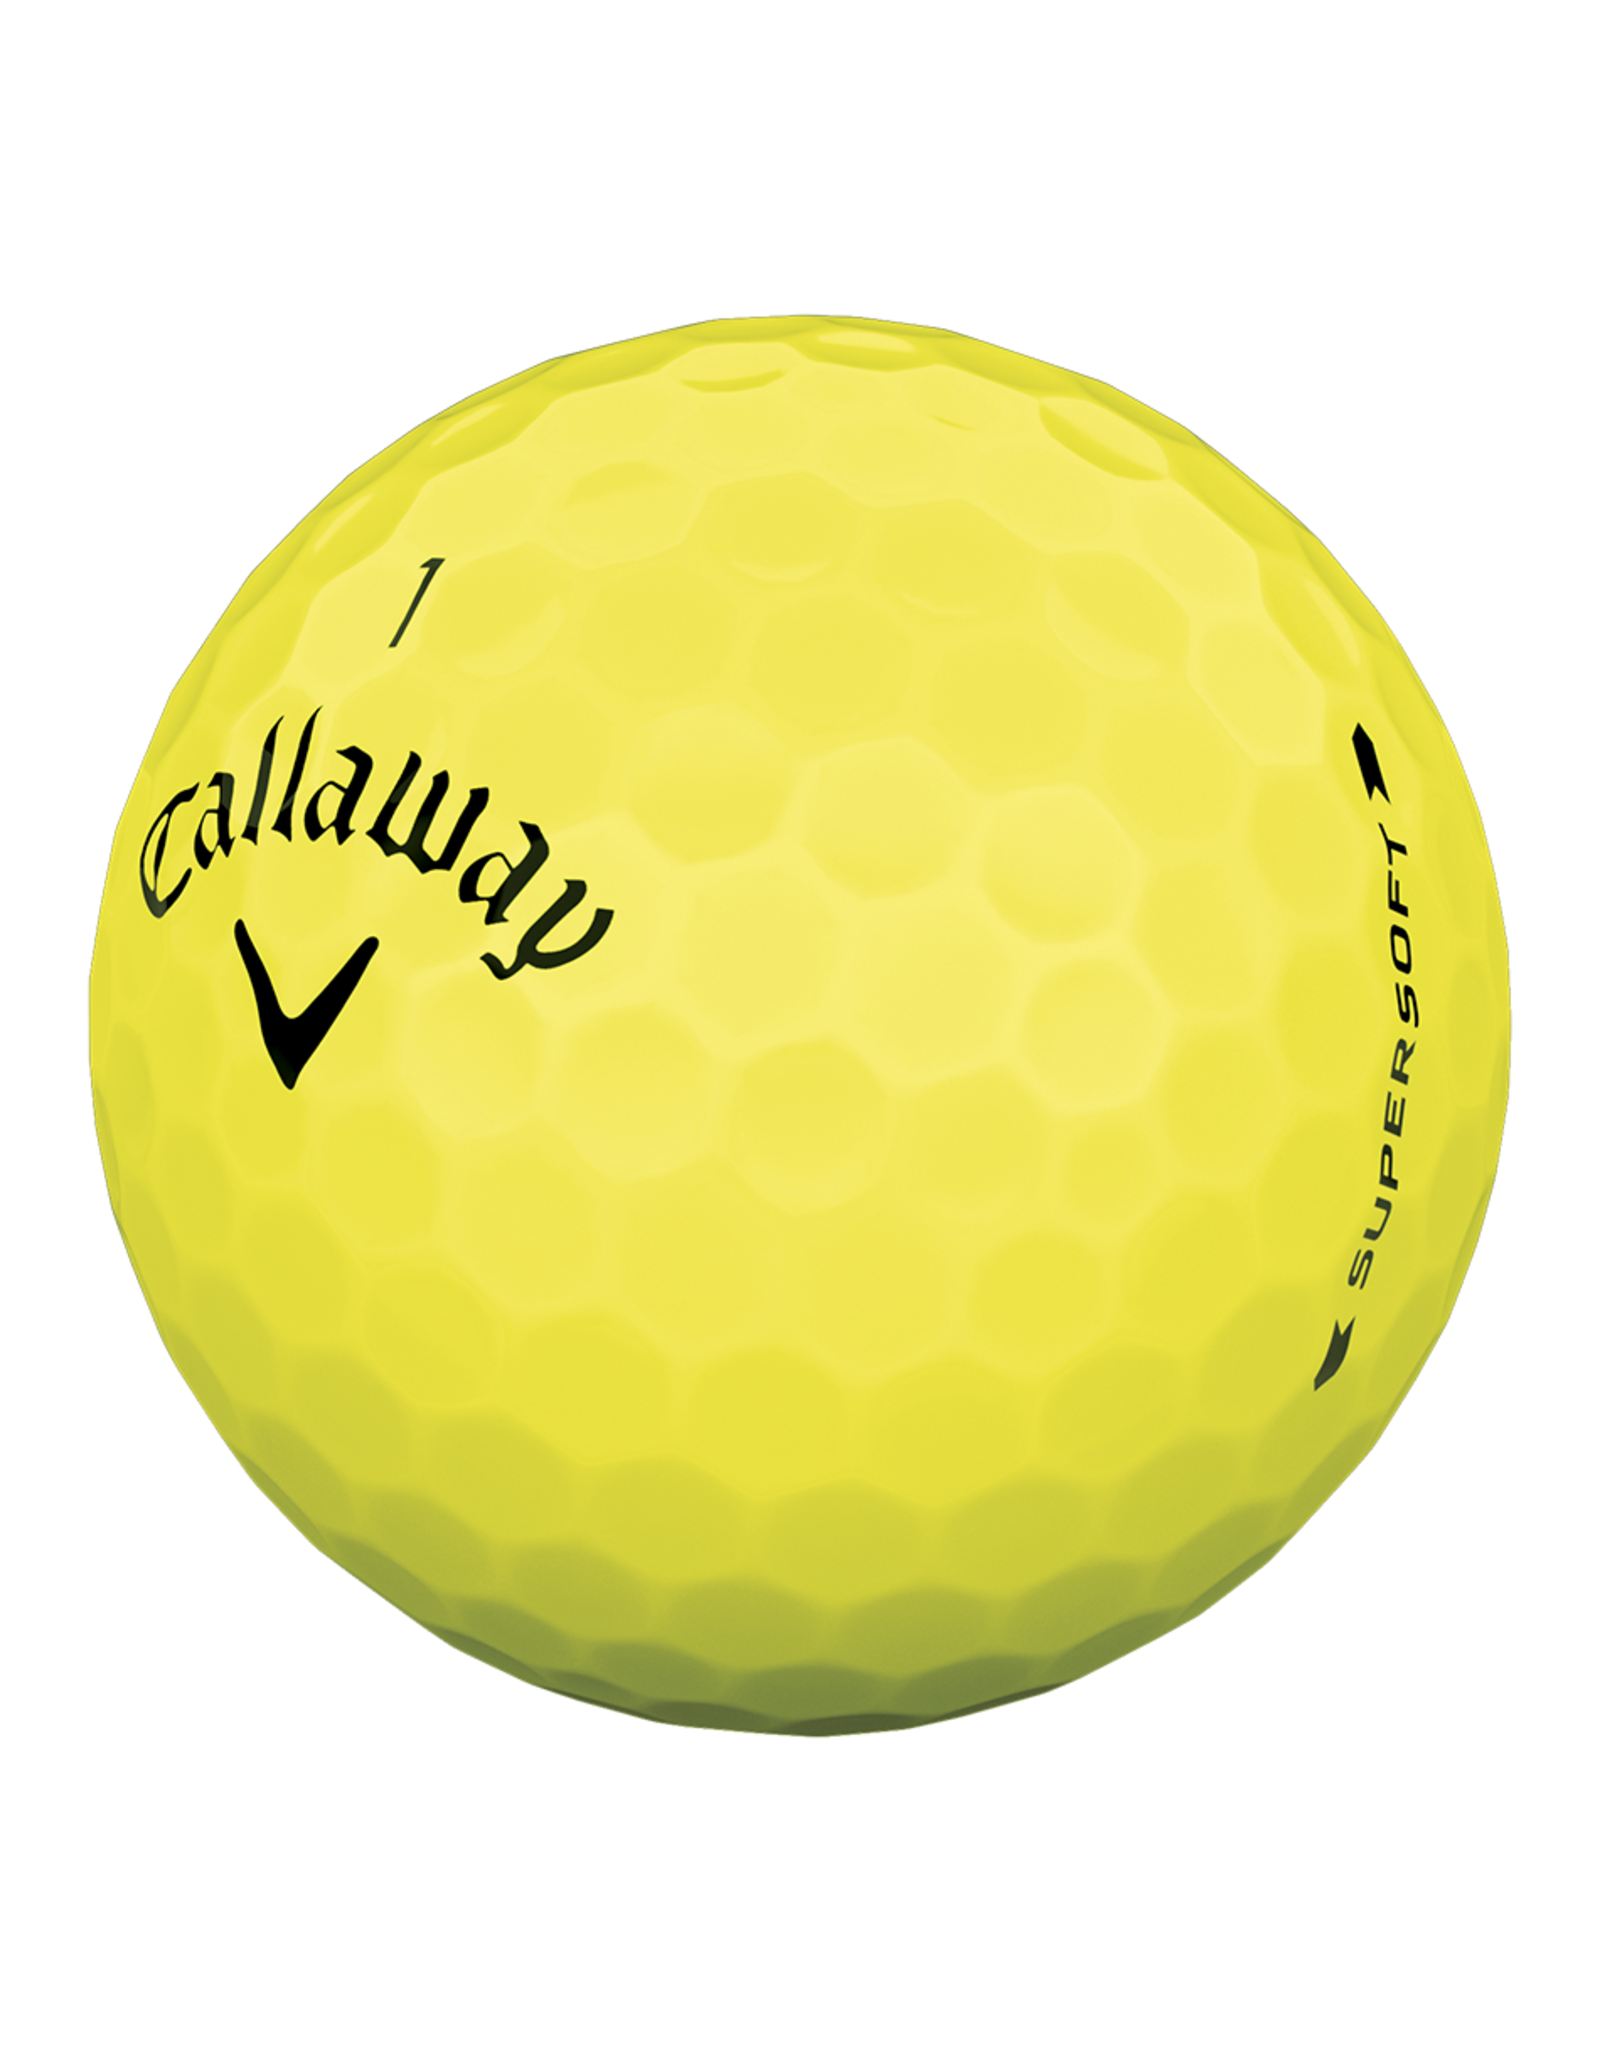 Callaway Calawah Supersoft Yellow Dozen